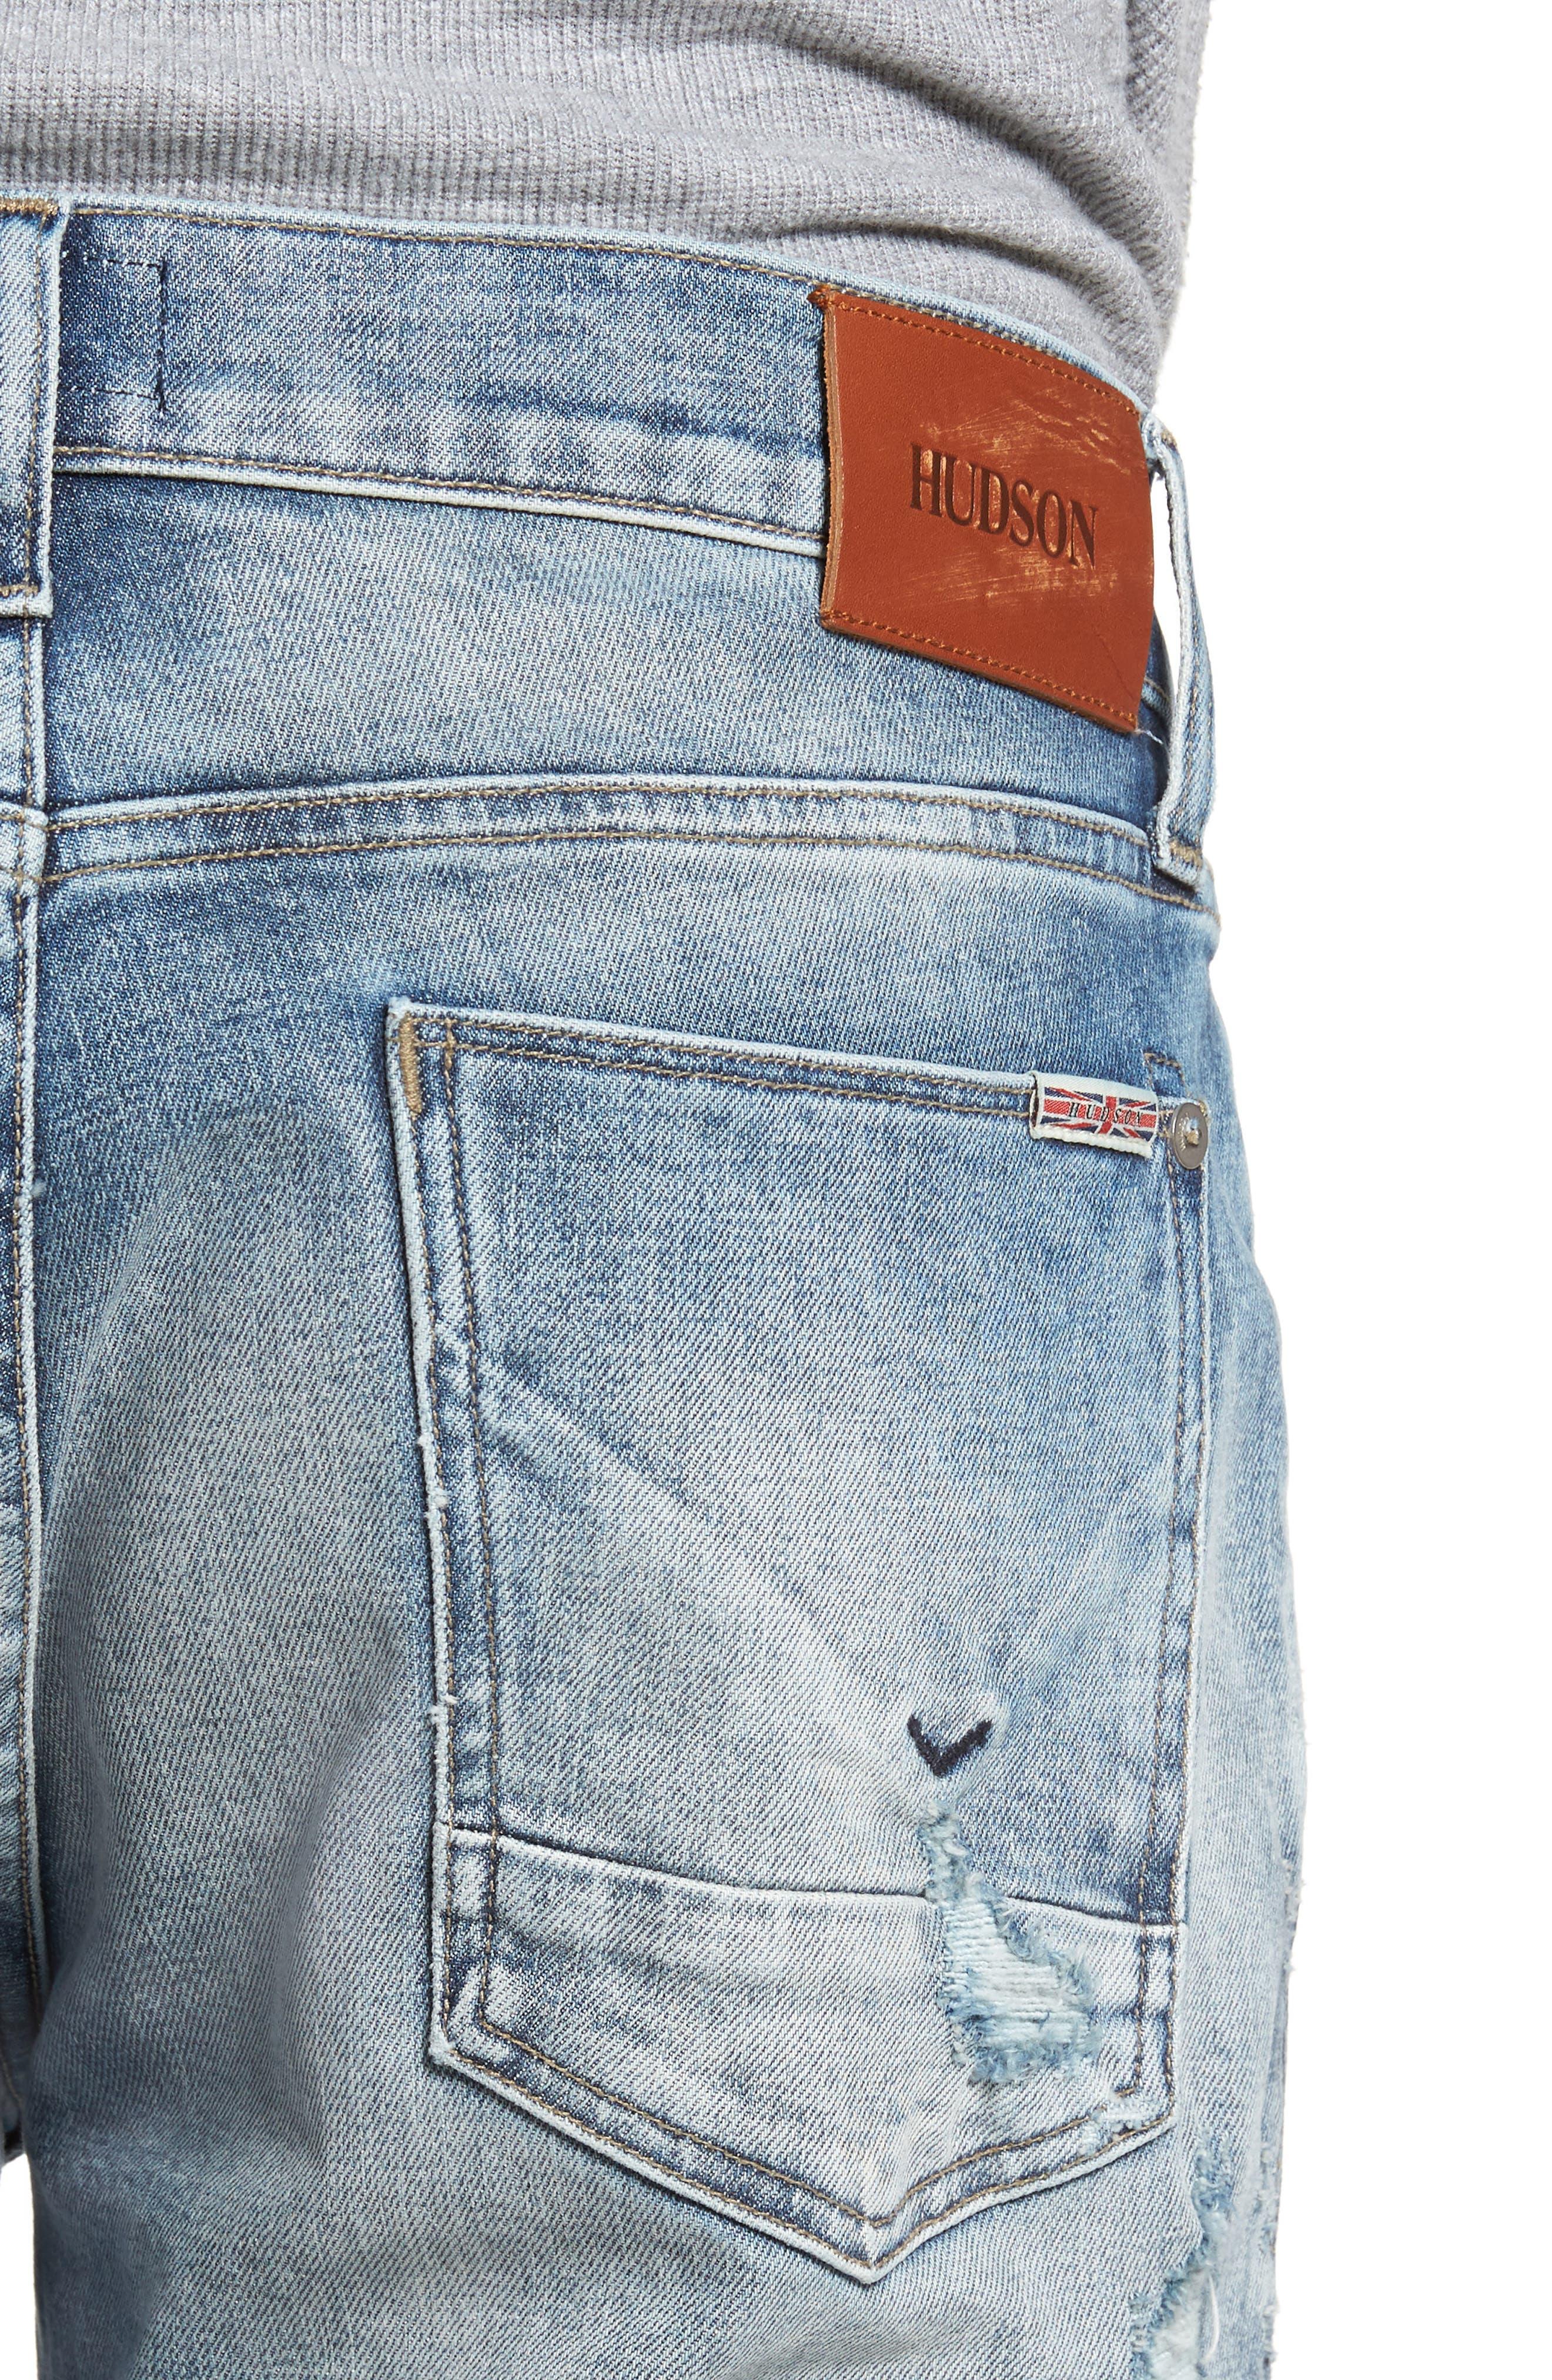 Blake Slim Fit Jeans,                             Alternate thumbnail 4, color,                             Lockwood